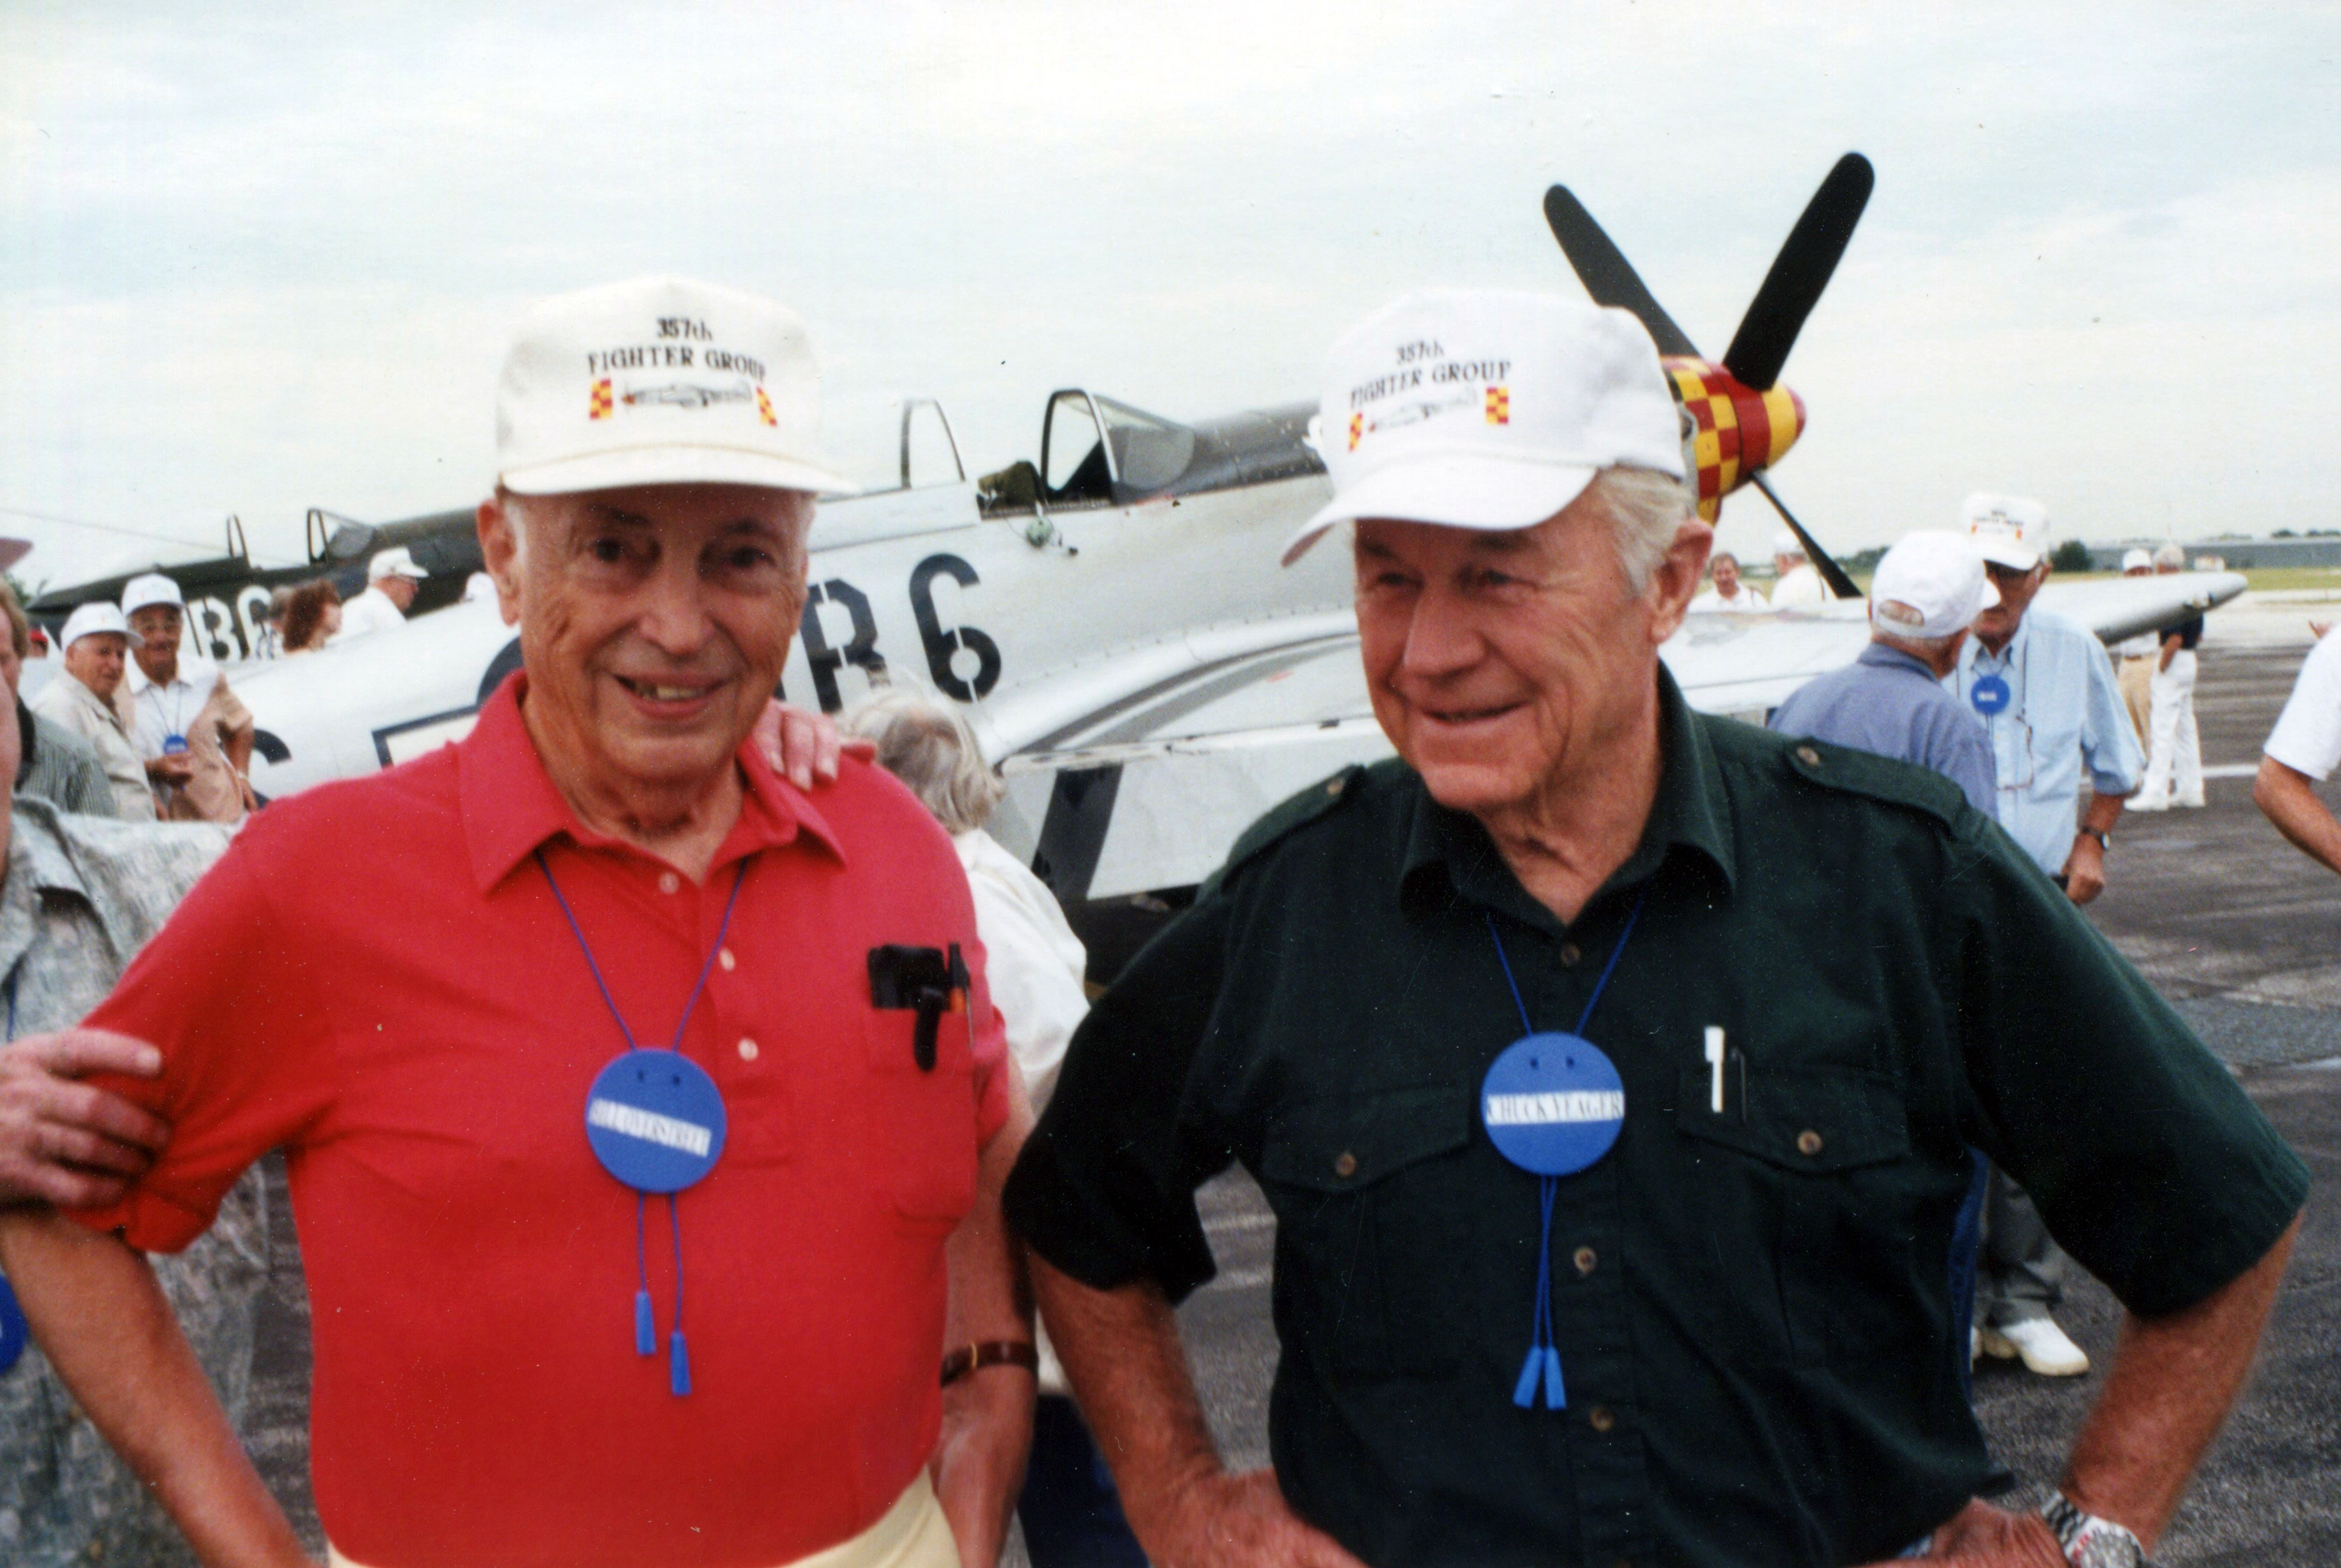 Bill and Chuck